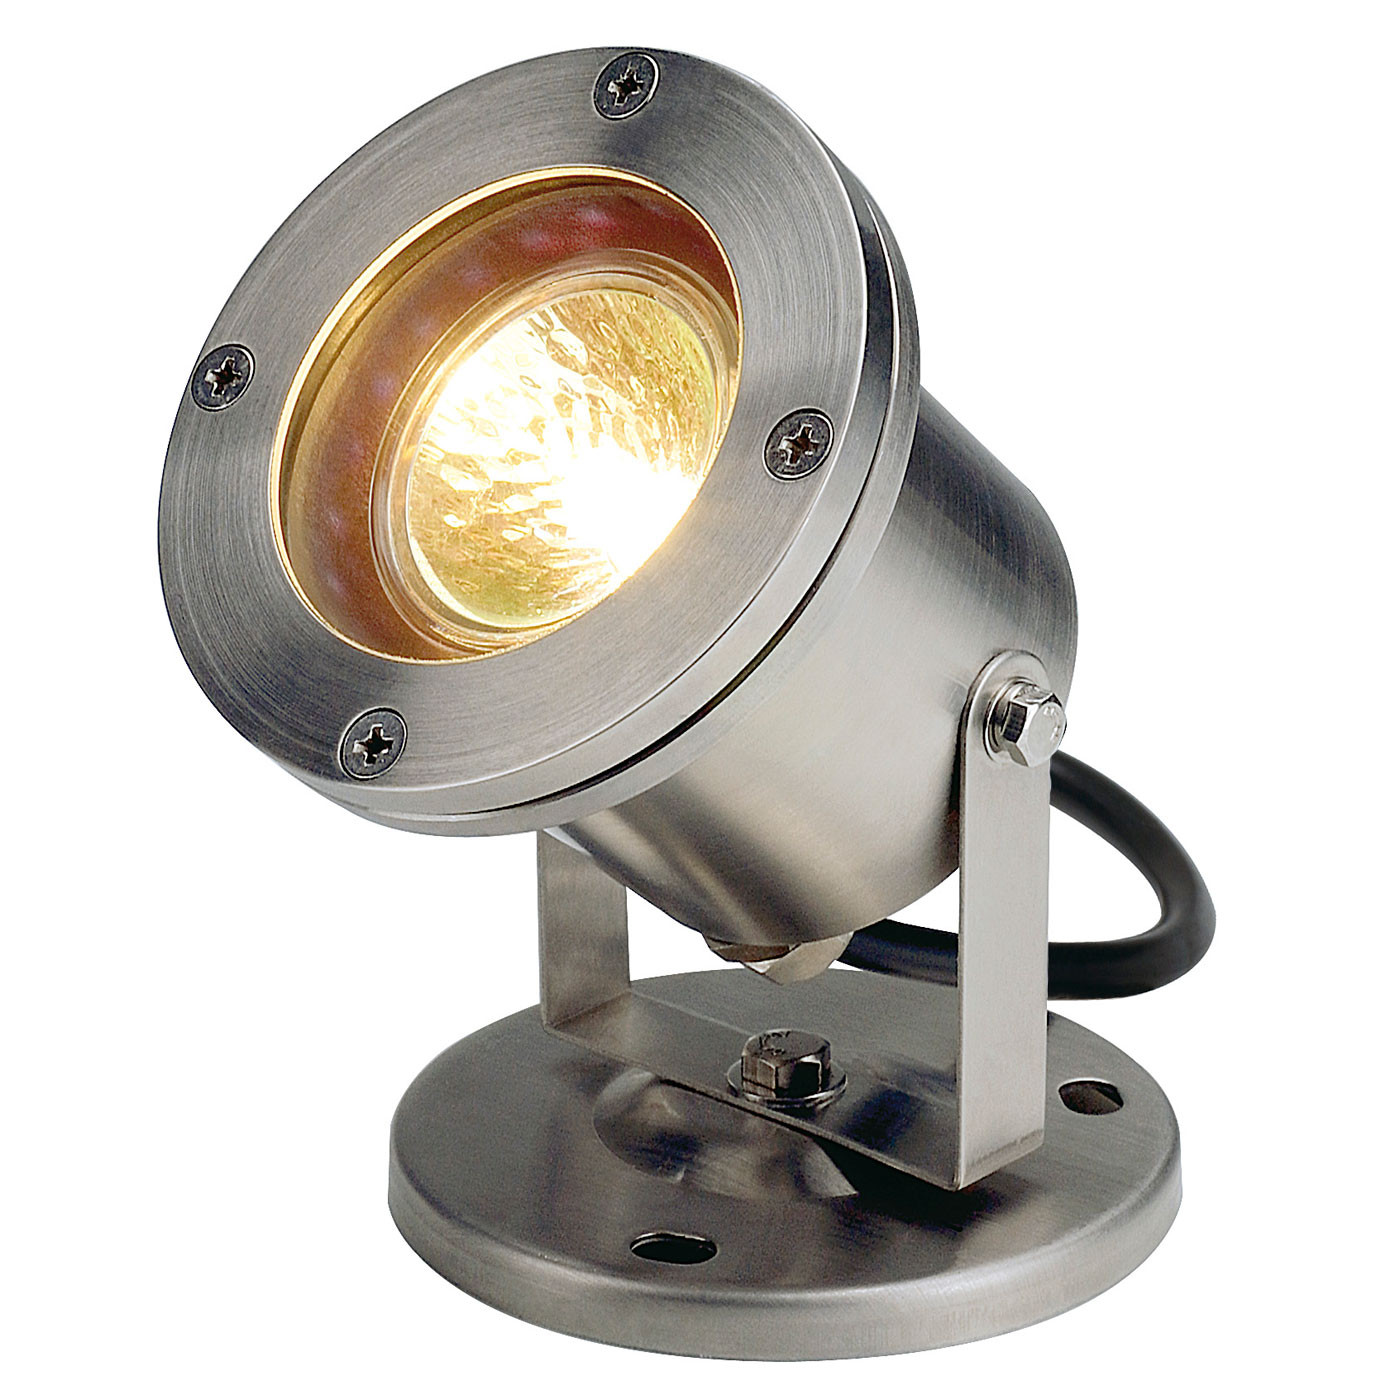 SLV Nautilus MR16 Inox lampadaire